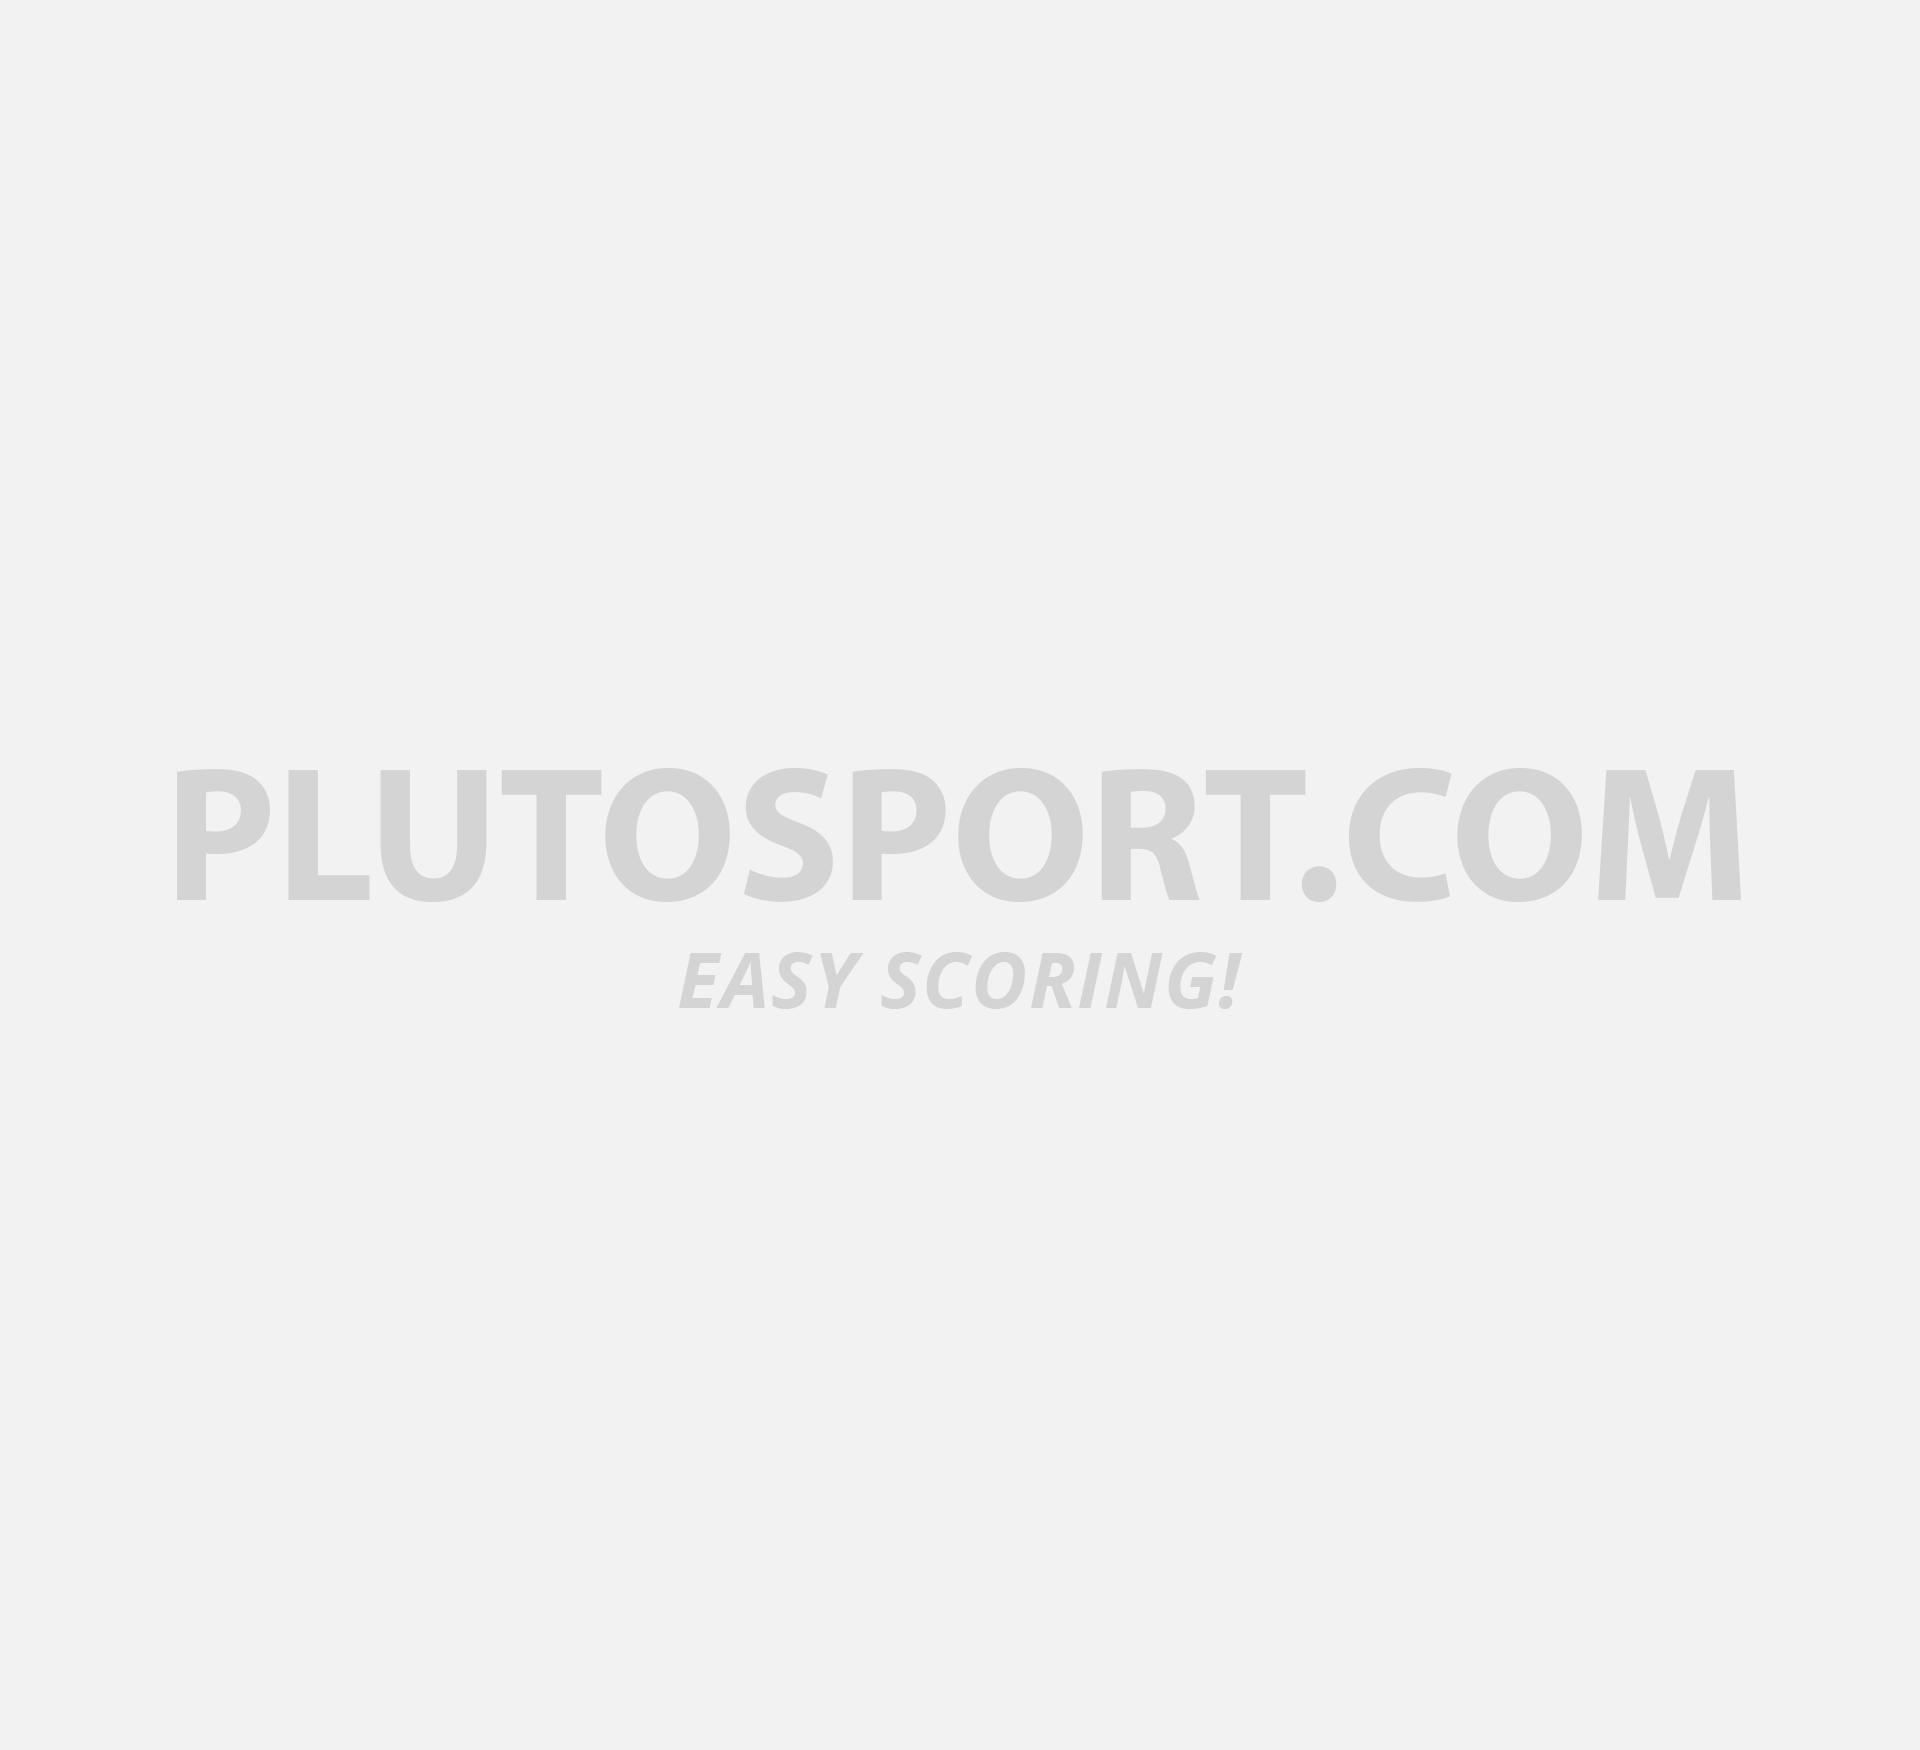 c63b2d6ab87 Fila Shadow 84 Lady - Not adjustable - Inline skates - Skates - Skating -  Sports | Plutosport